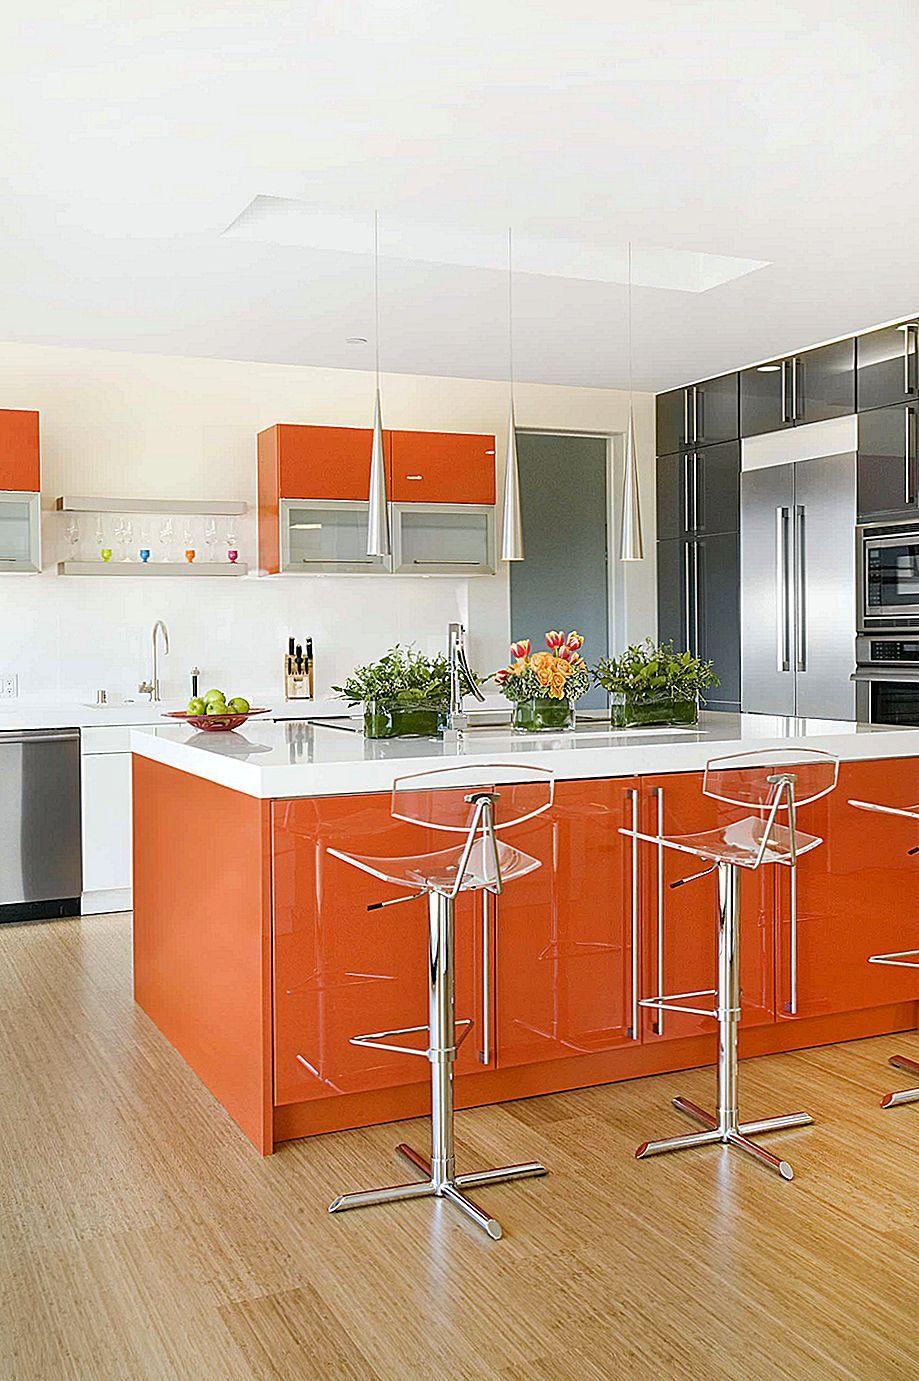 Burnt Orange Kitchen Decor Ideas Orange Kitchen Decor Kitchen Design Color Contemporary Kitchen